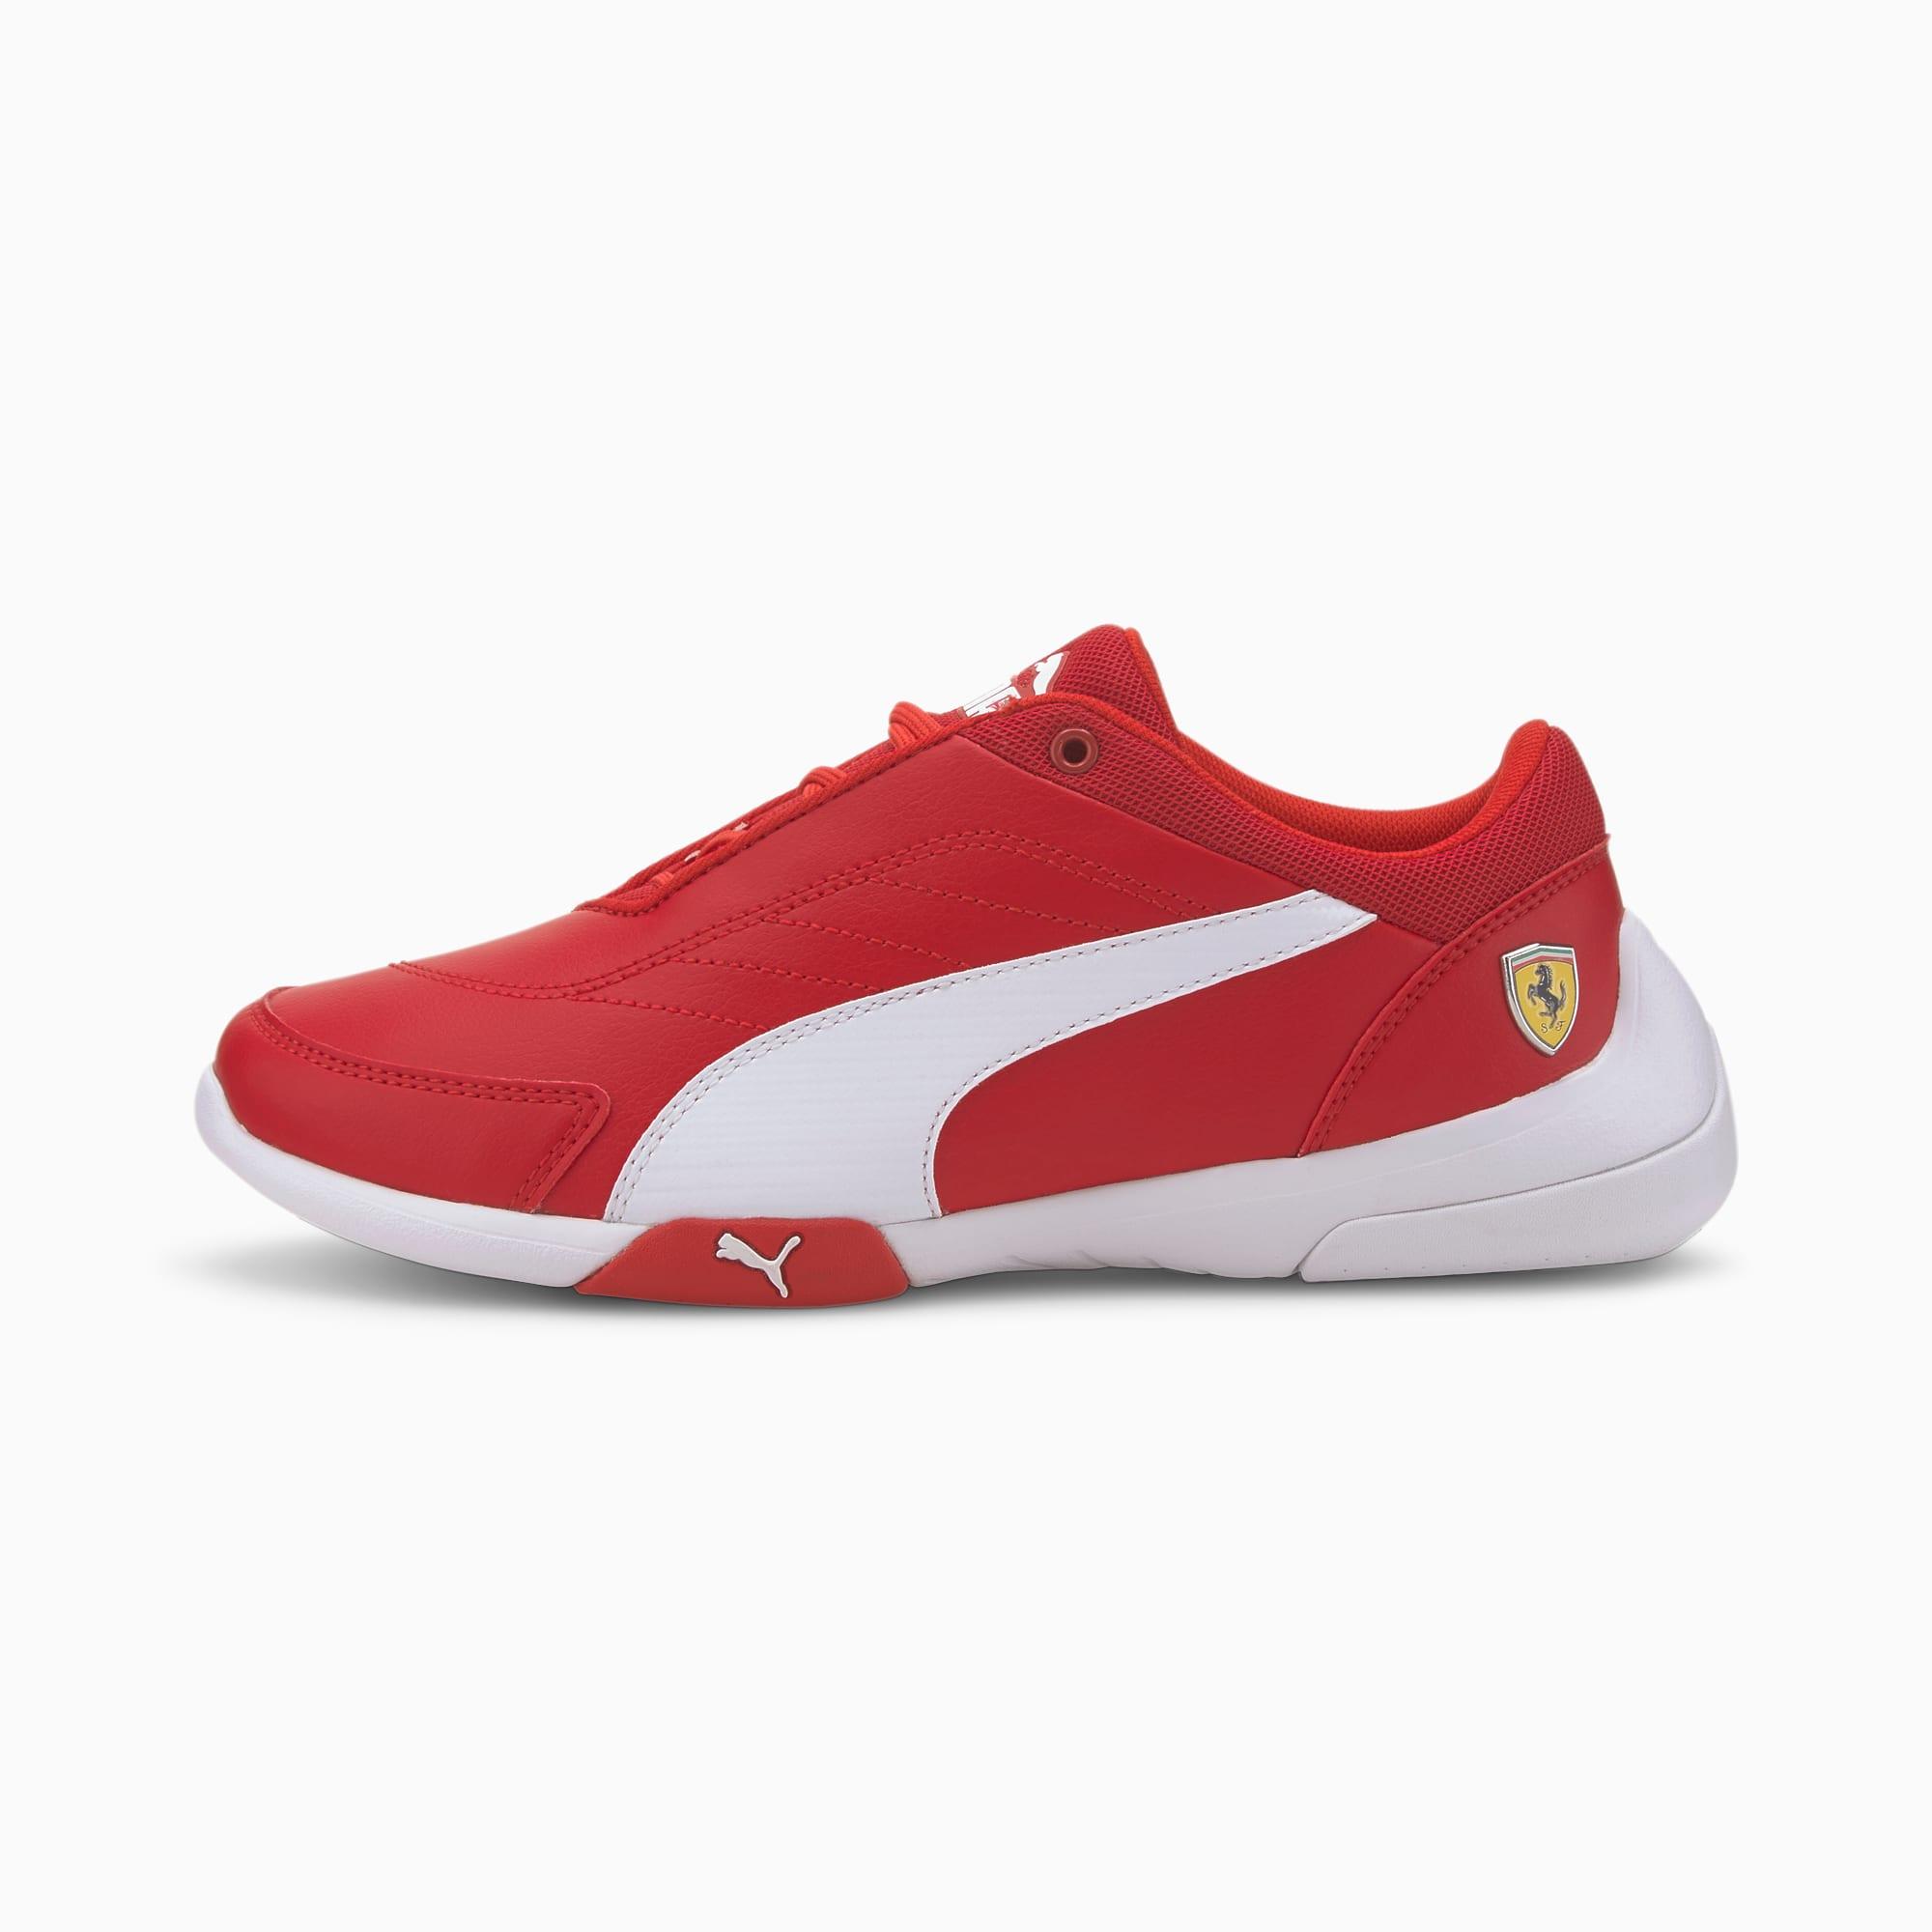 New PUMA SF Ferrari Kart Cat III Mens Casual Shoes Driving Fashion Sneakers